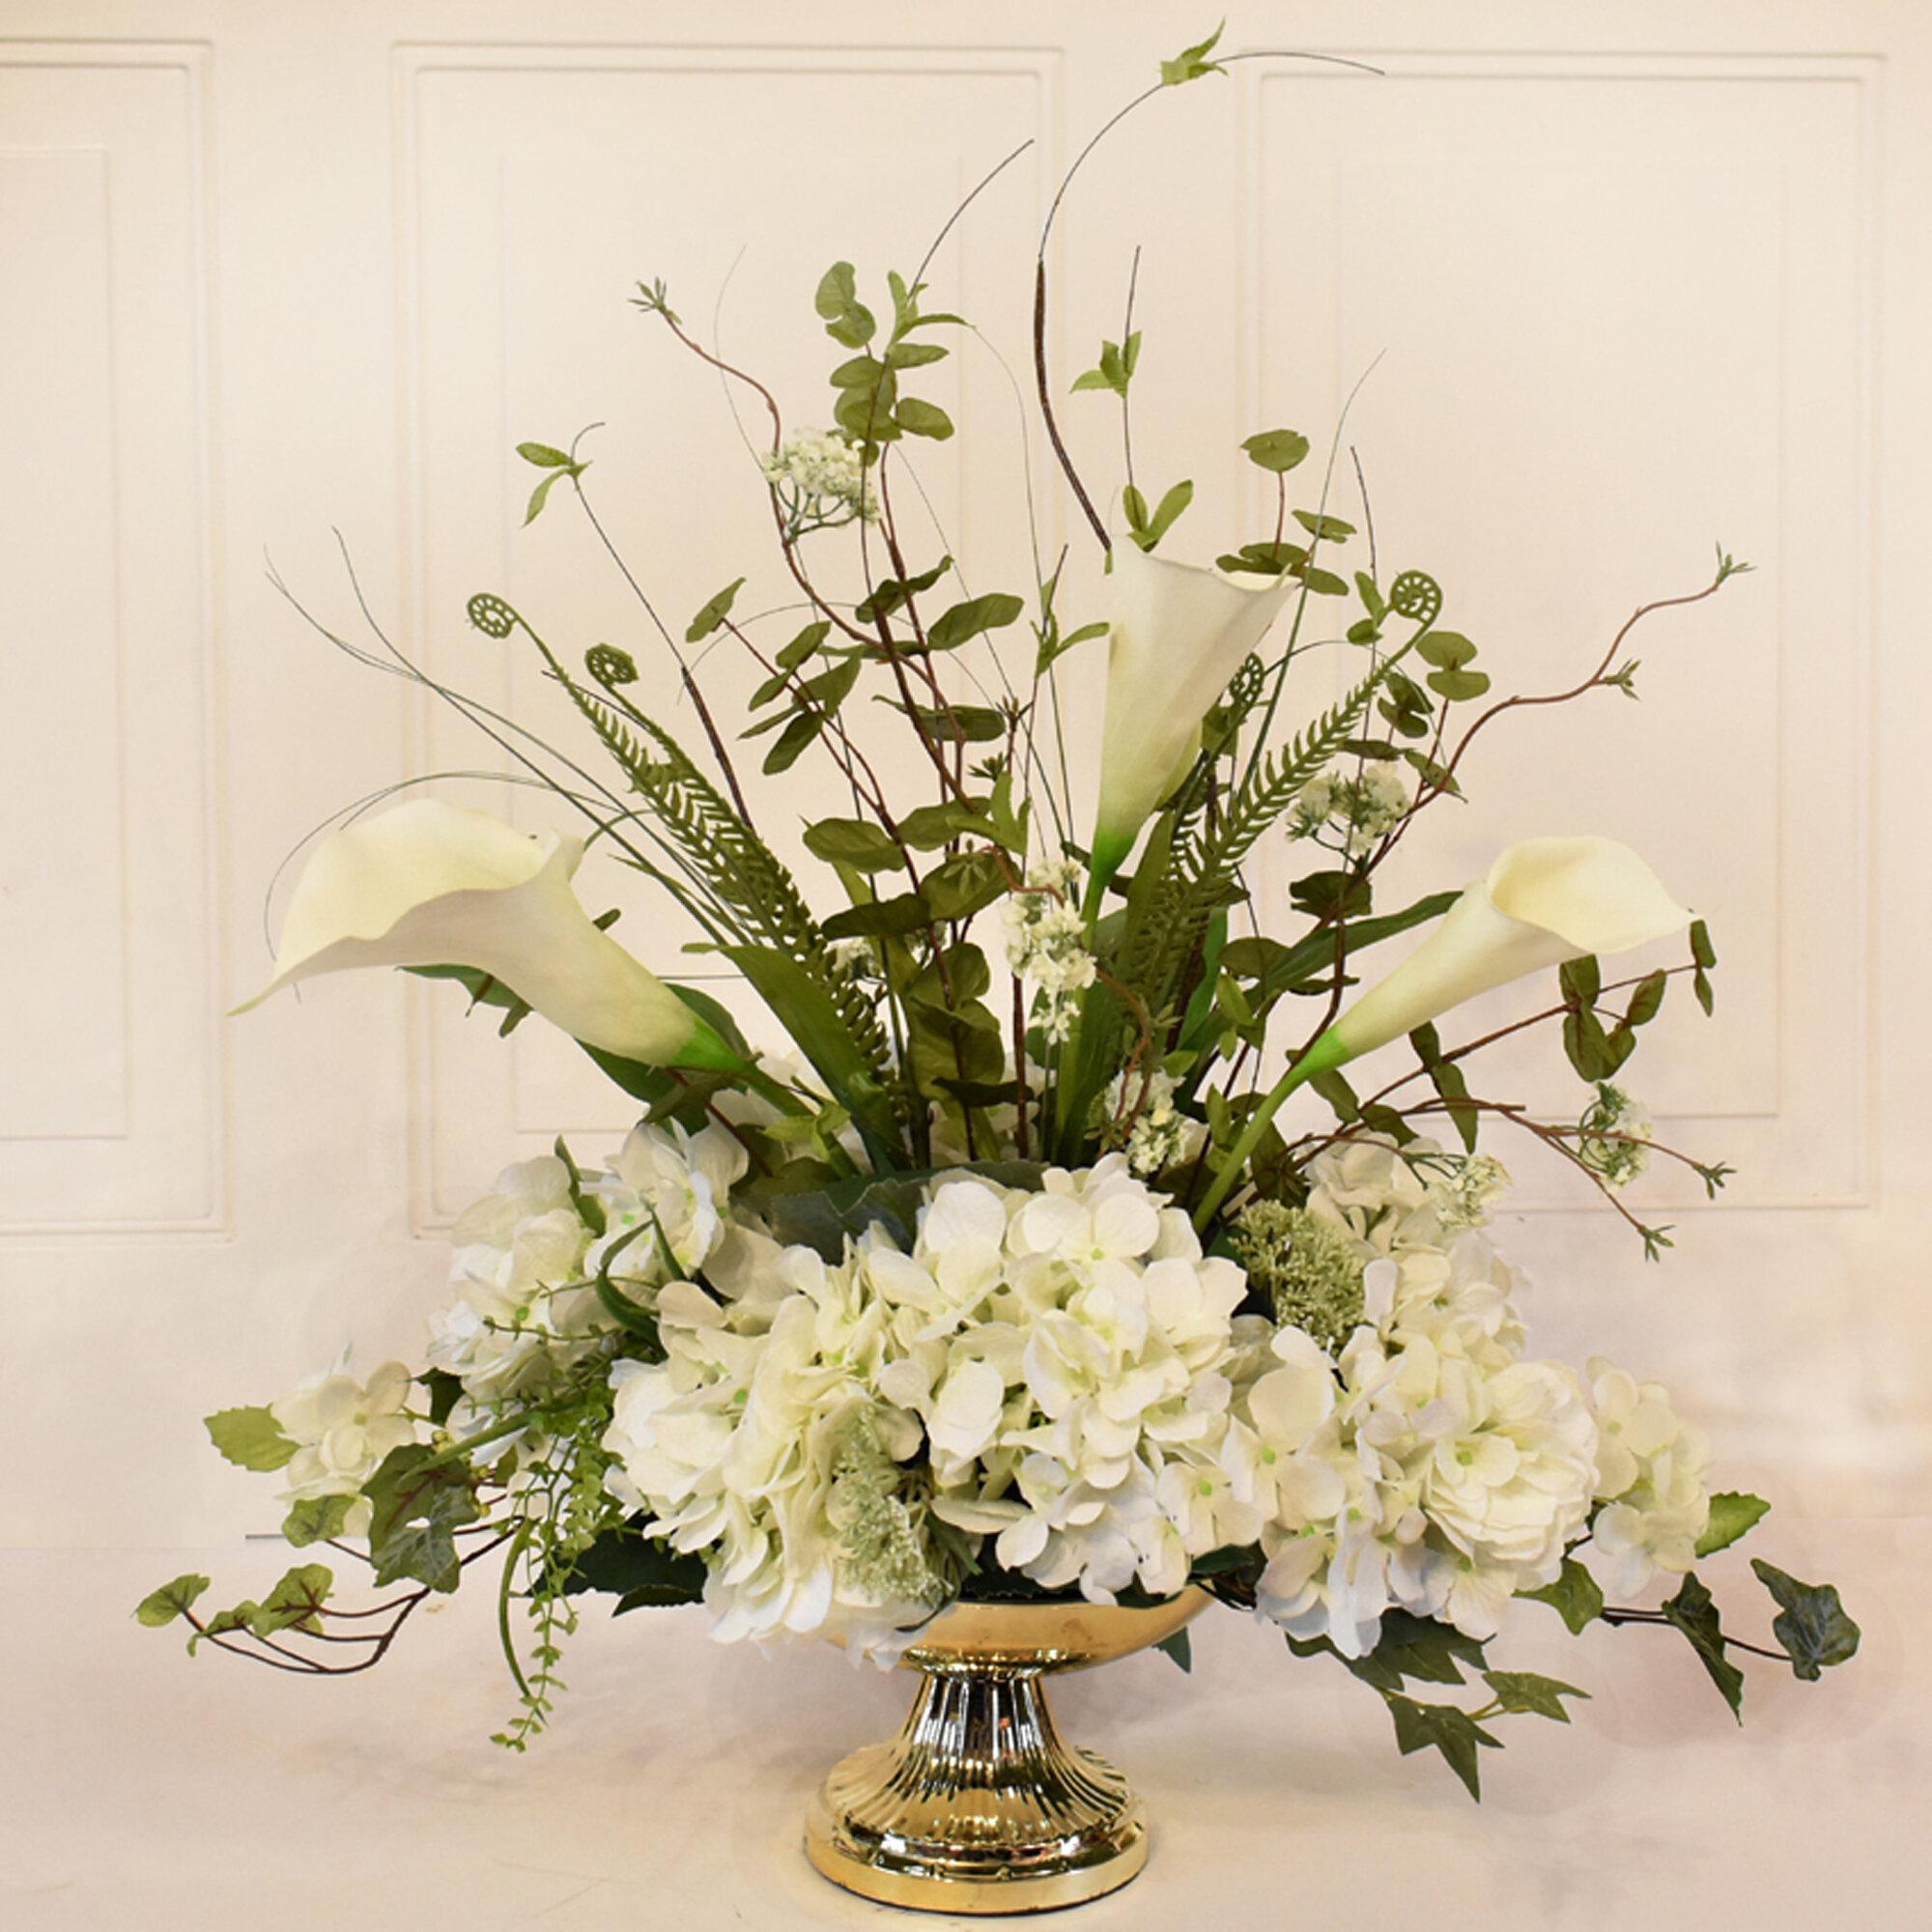 Marvelous Calla Lily Silk Hydrangea And Orchid Centerpiece In Decorative Vase Download Free Architecture Designs Scobabritishbridgeorg